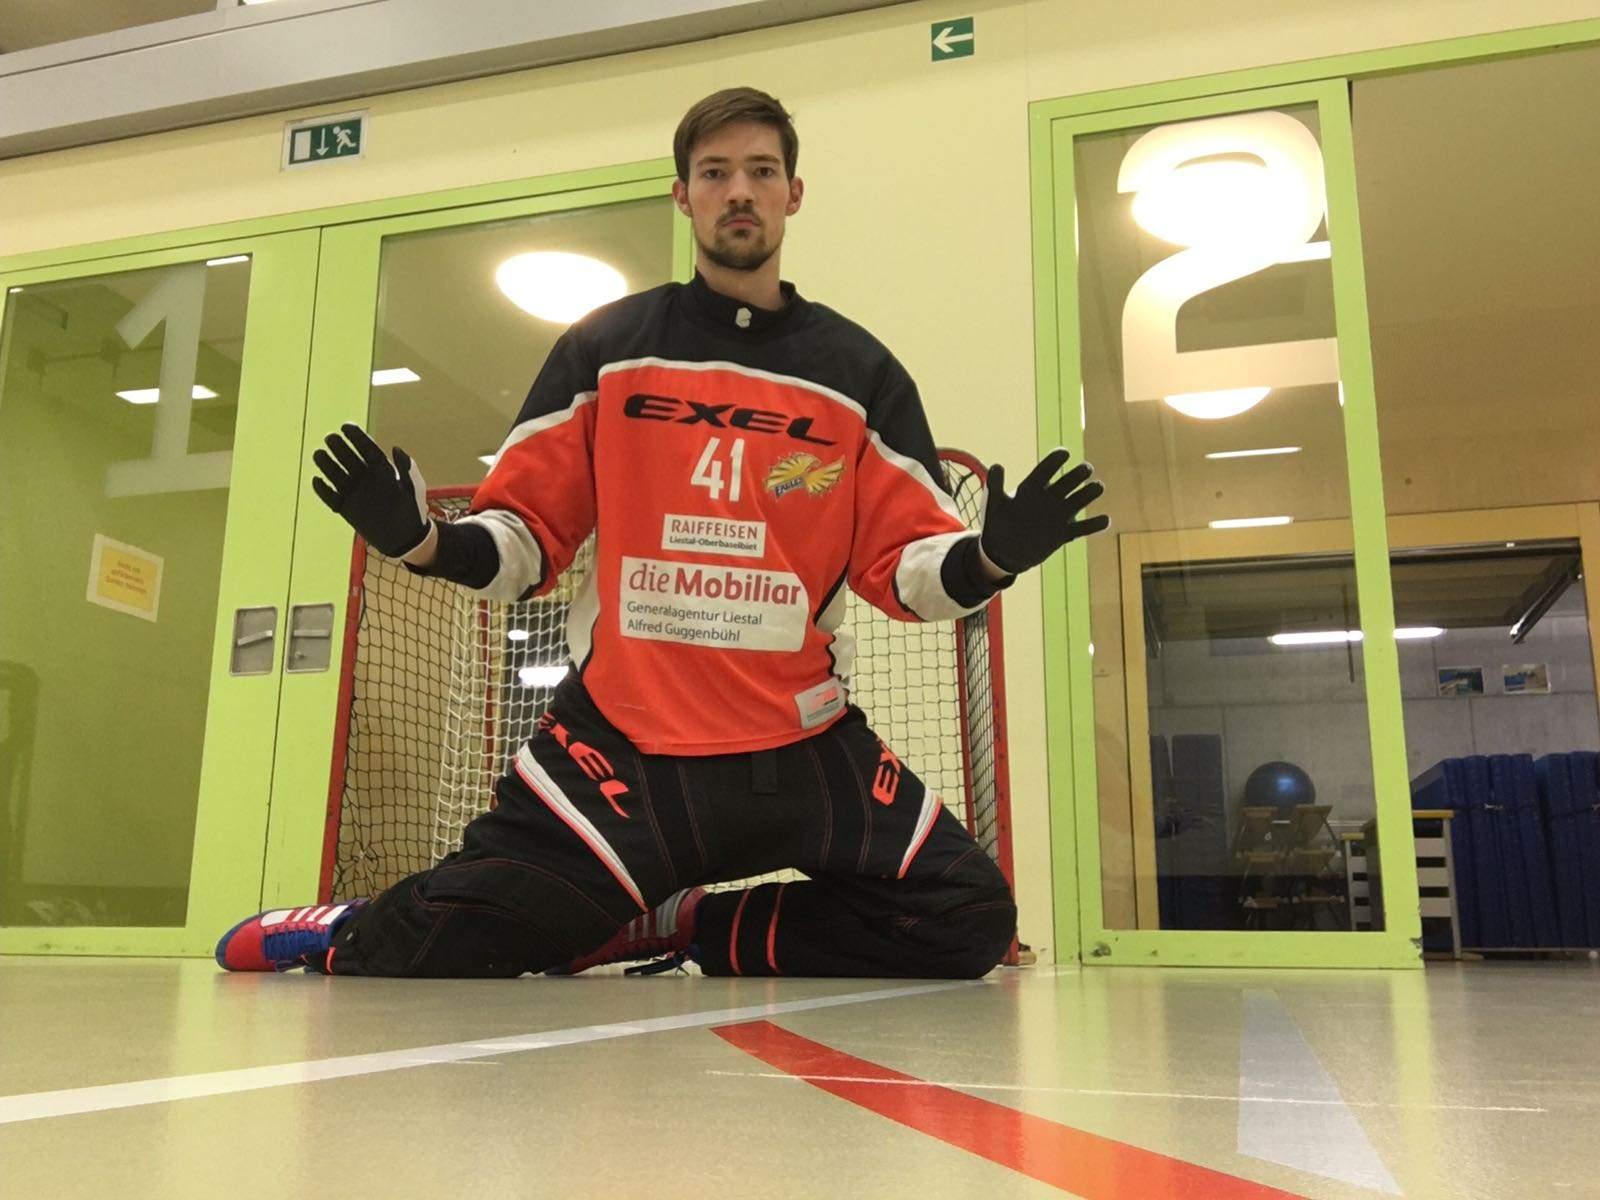 Floorball Goalie Closed Legs Front